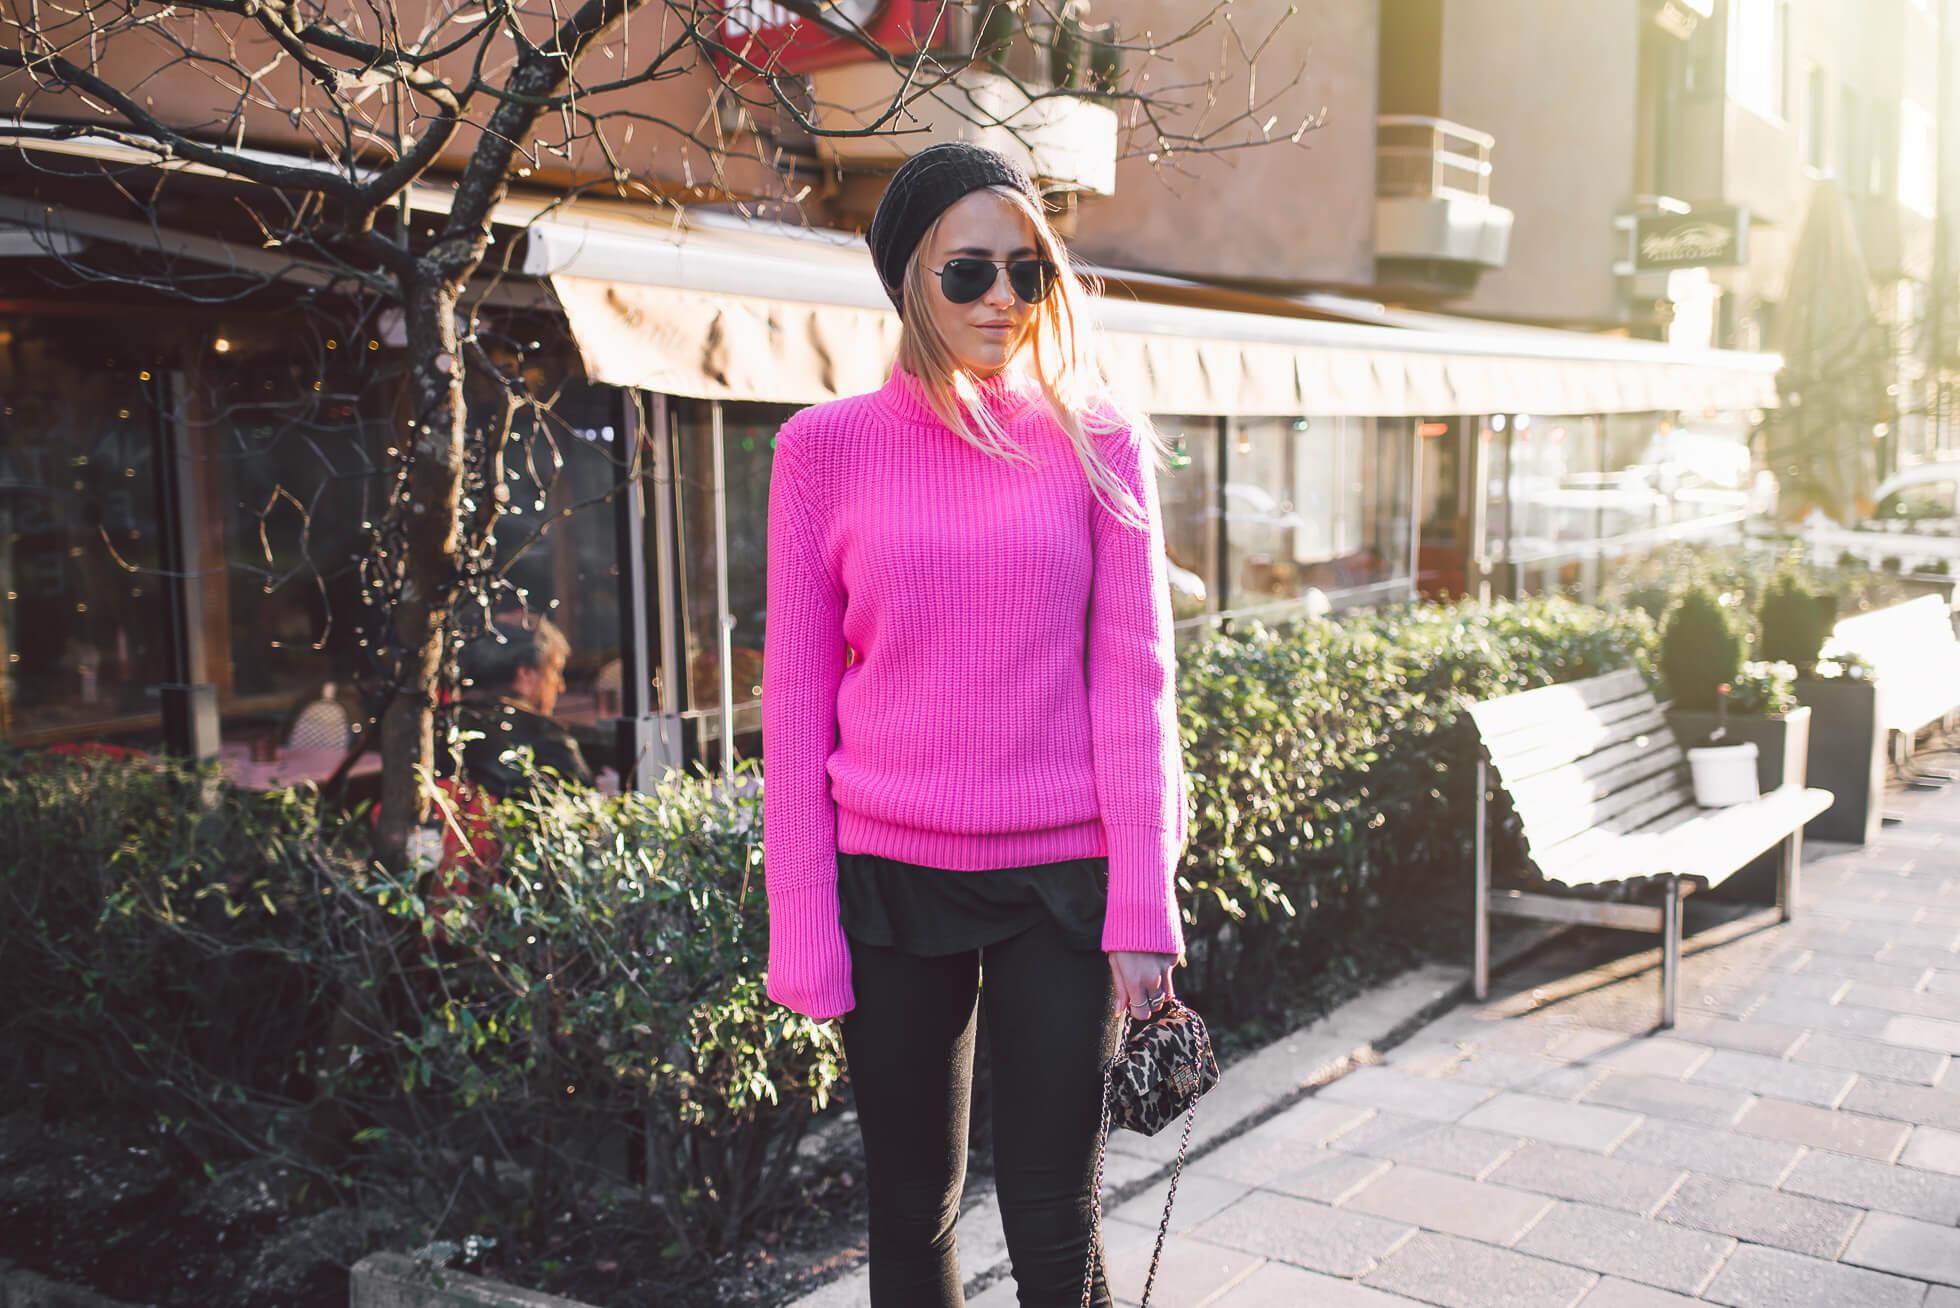 janni-deler-pink-touchDSC_2945-Redigera-Redigera